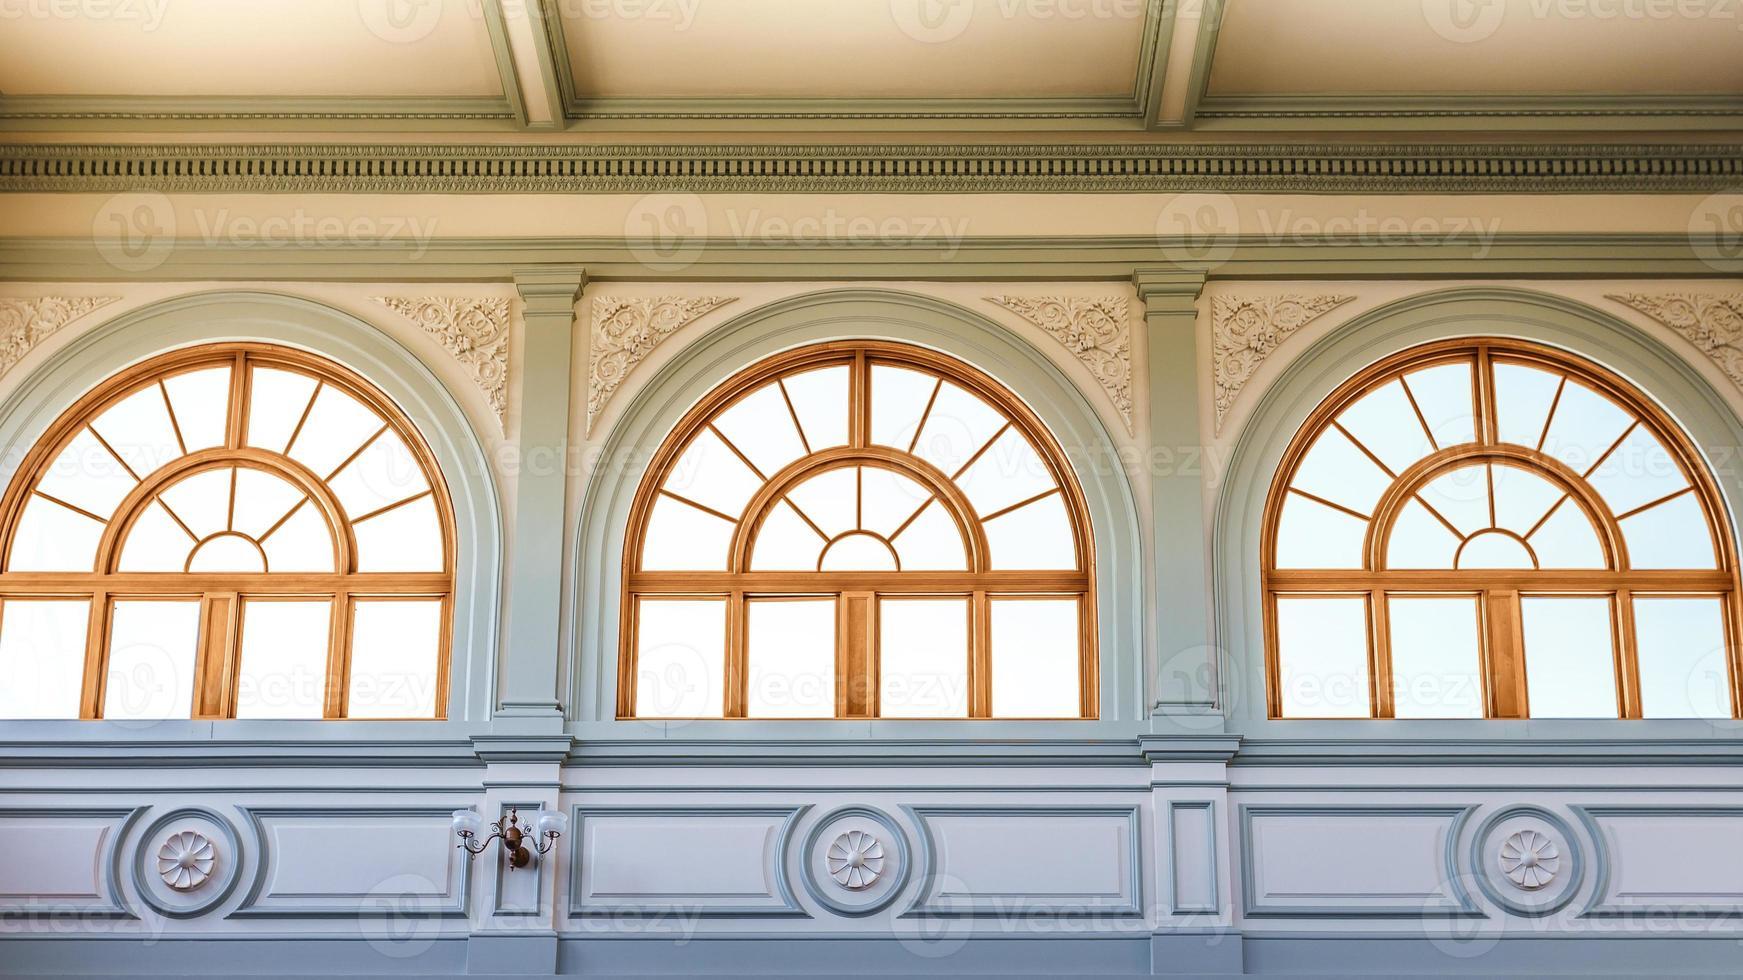 windows of Atlanta capitol foto